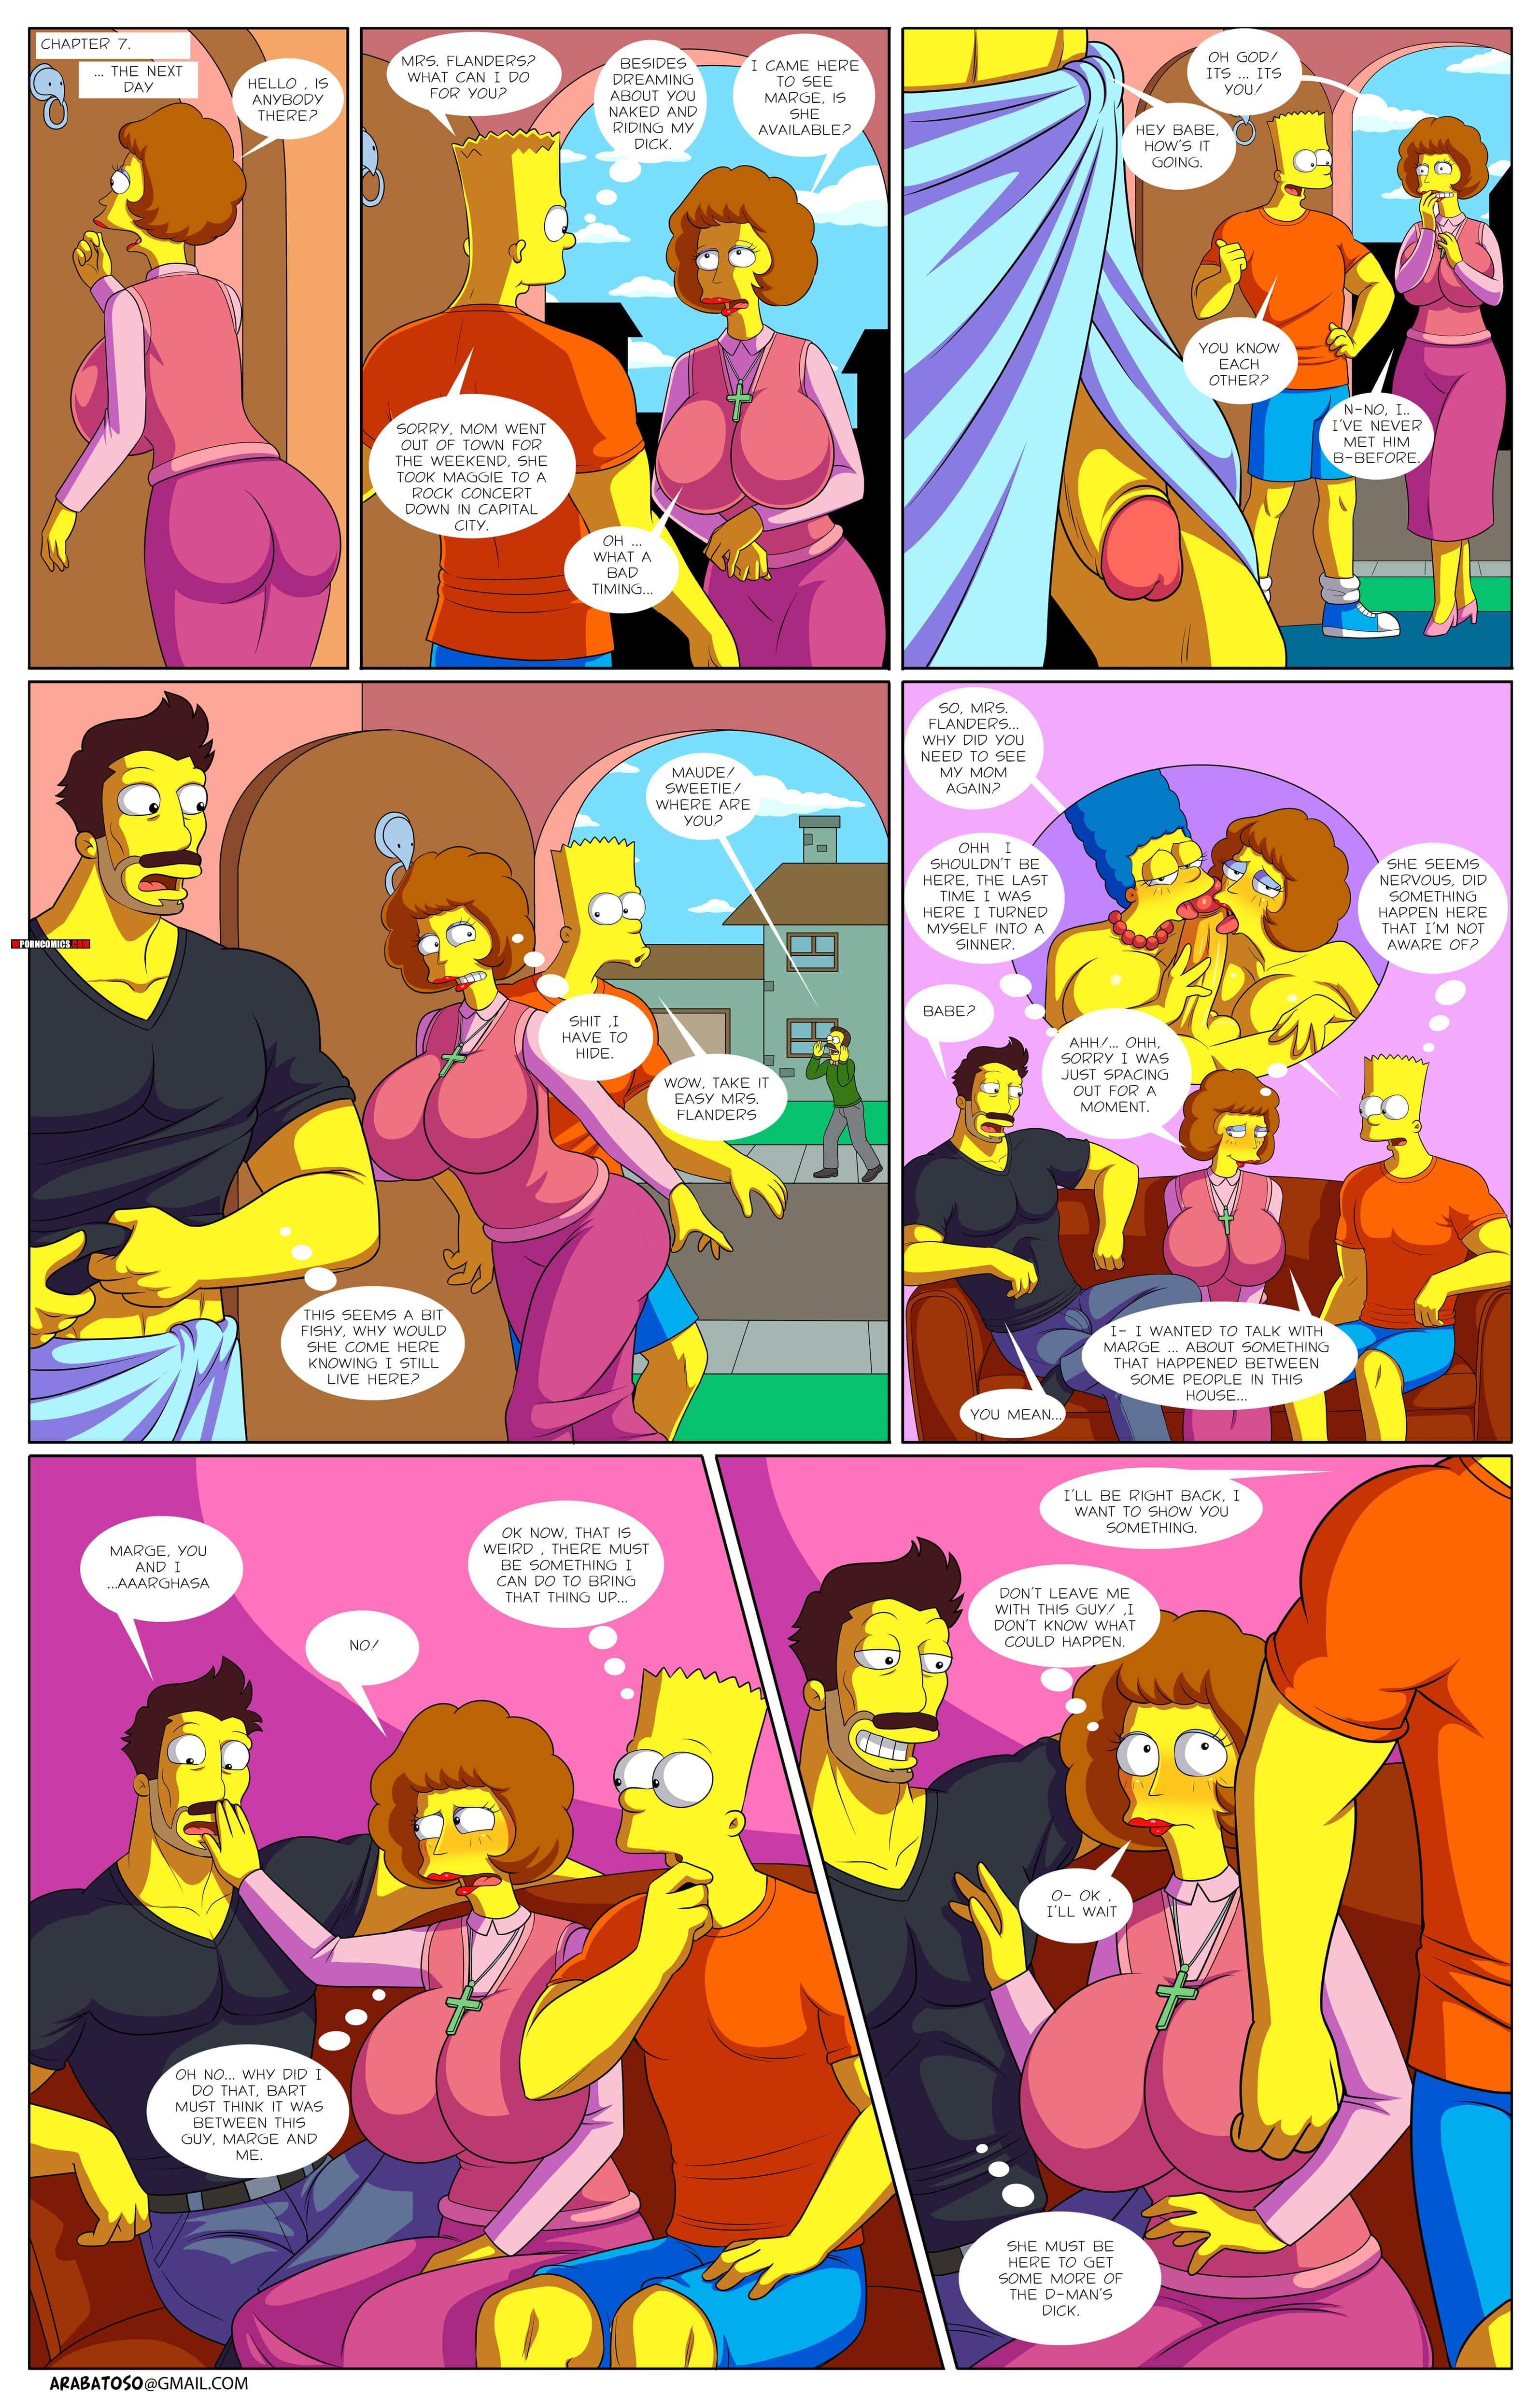 porn-comic-simpsons-darrens-adventure-part-3-2020-03-22/porn-comic-simpsons-darrens-adventure-part-3-2020-03-22-28023.jpg